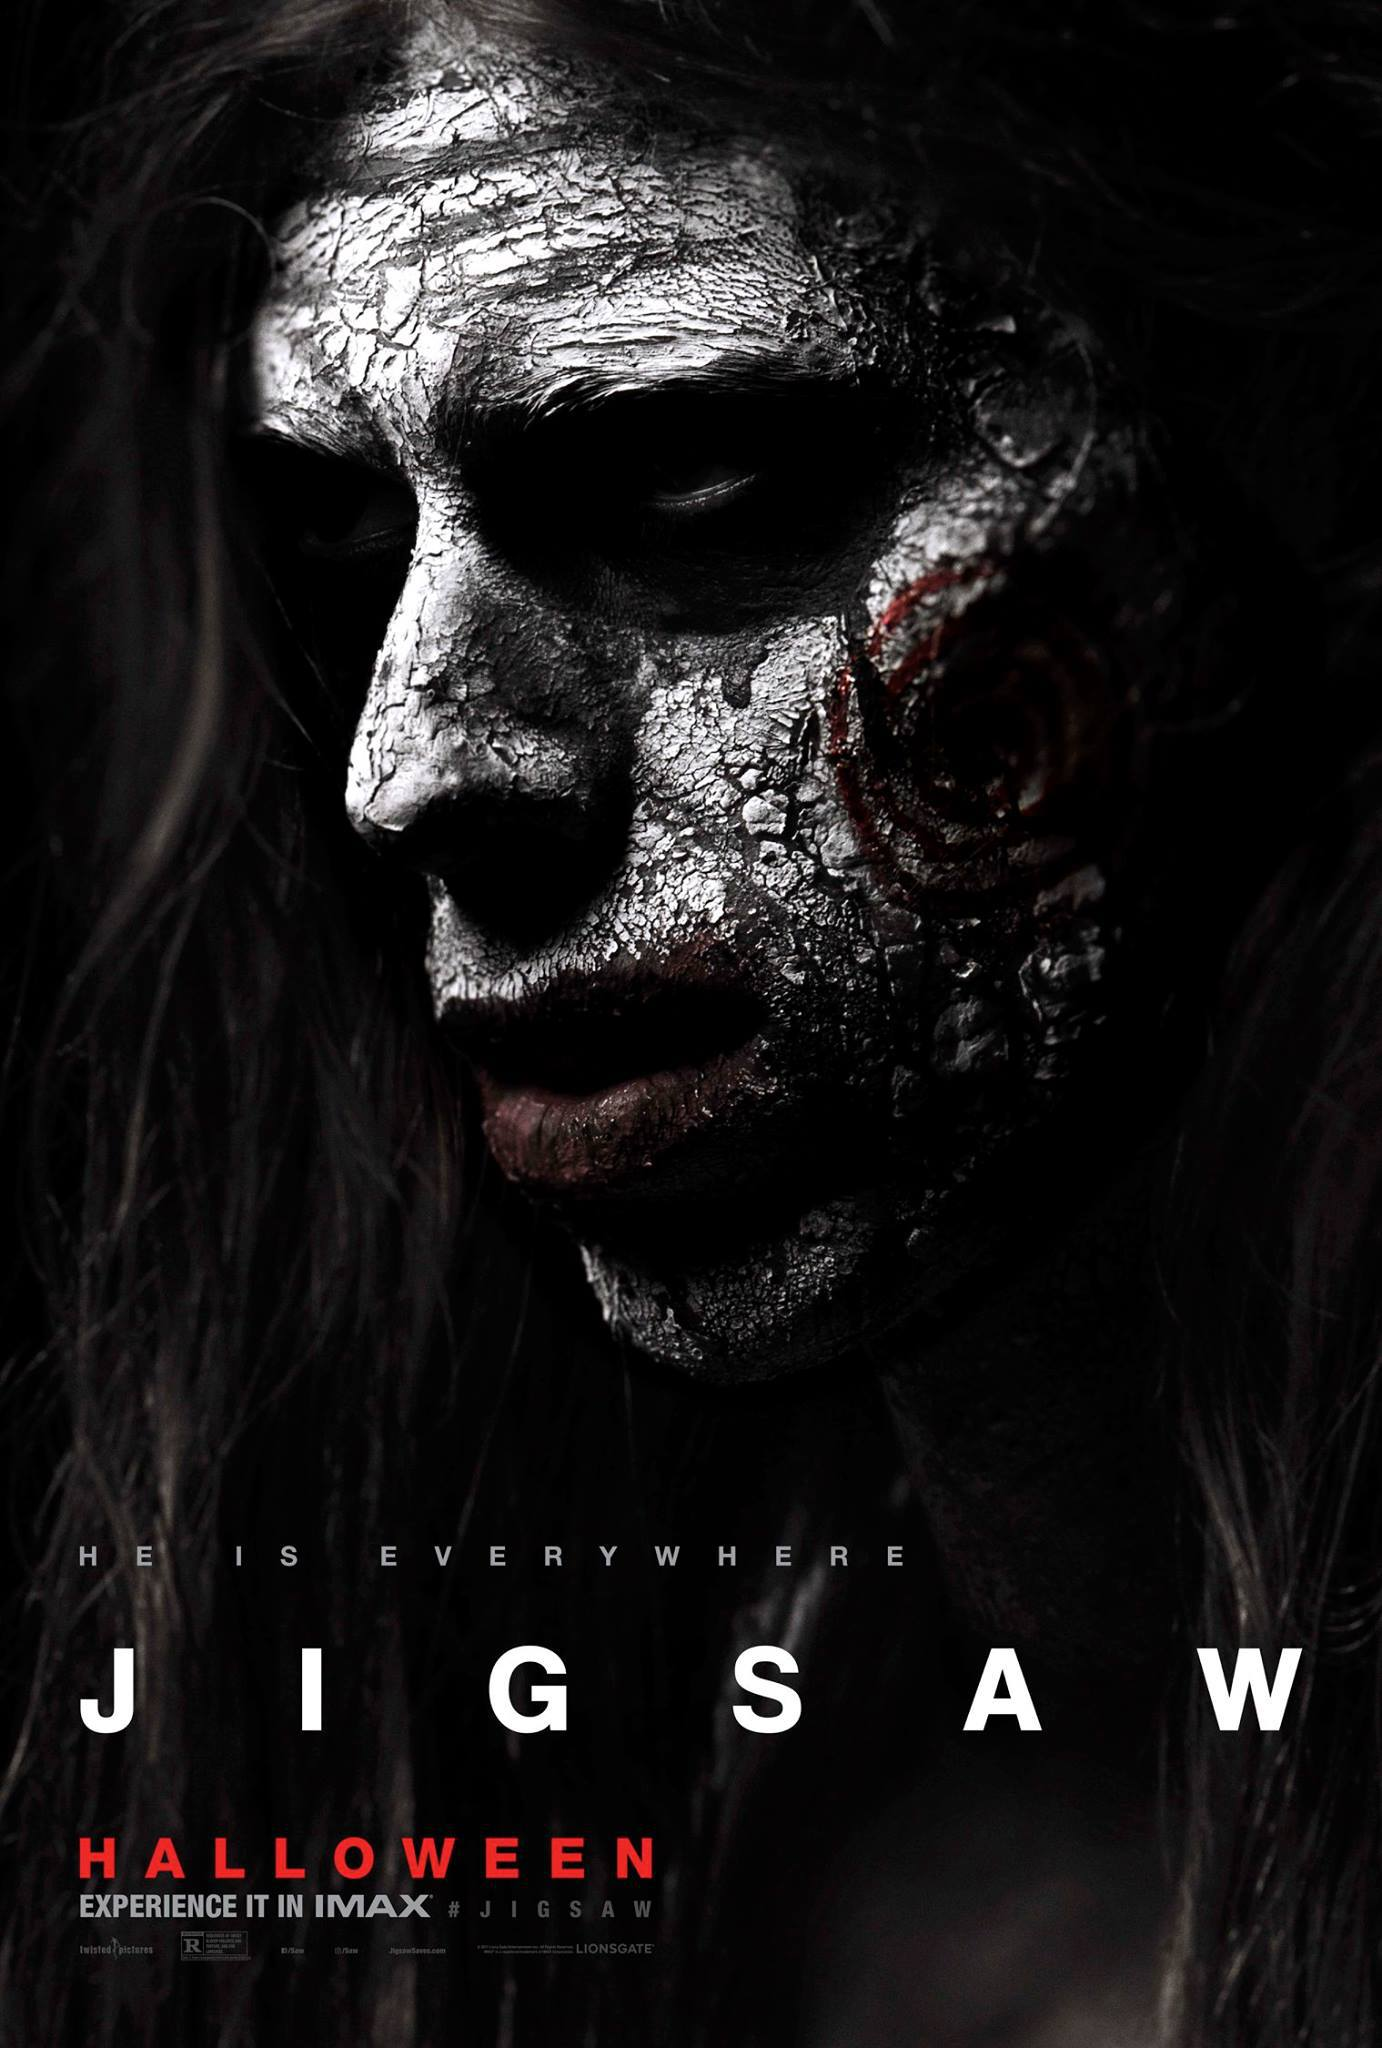 Jigsaw character2